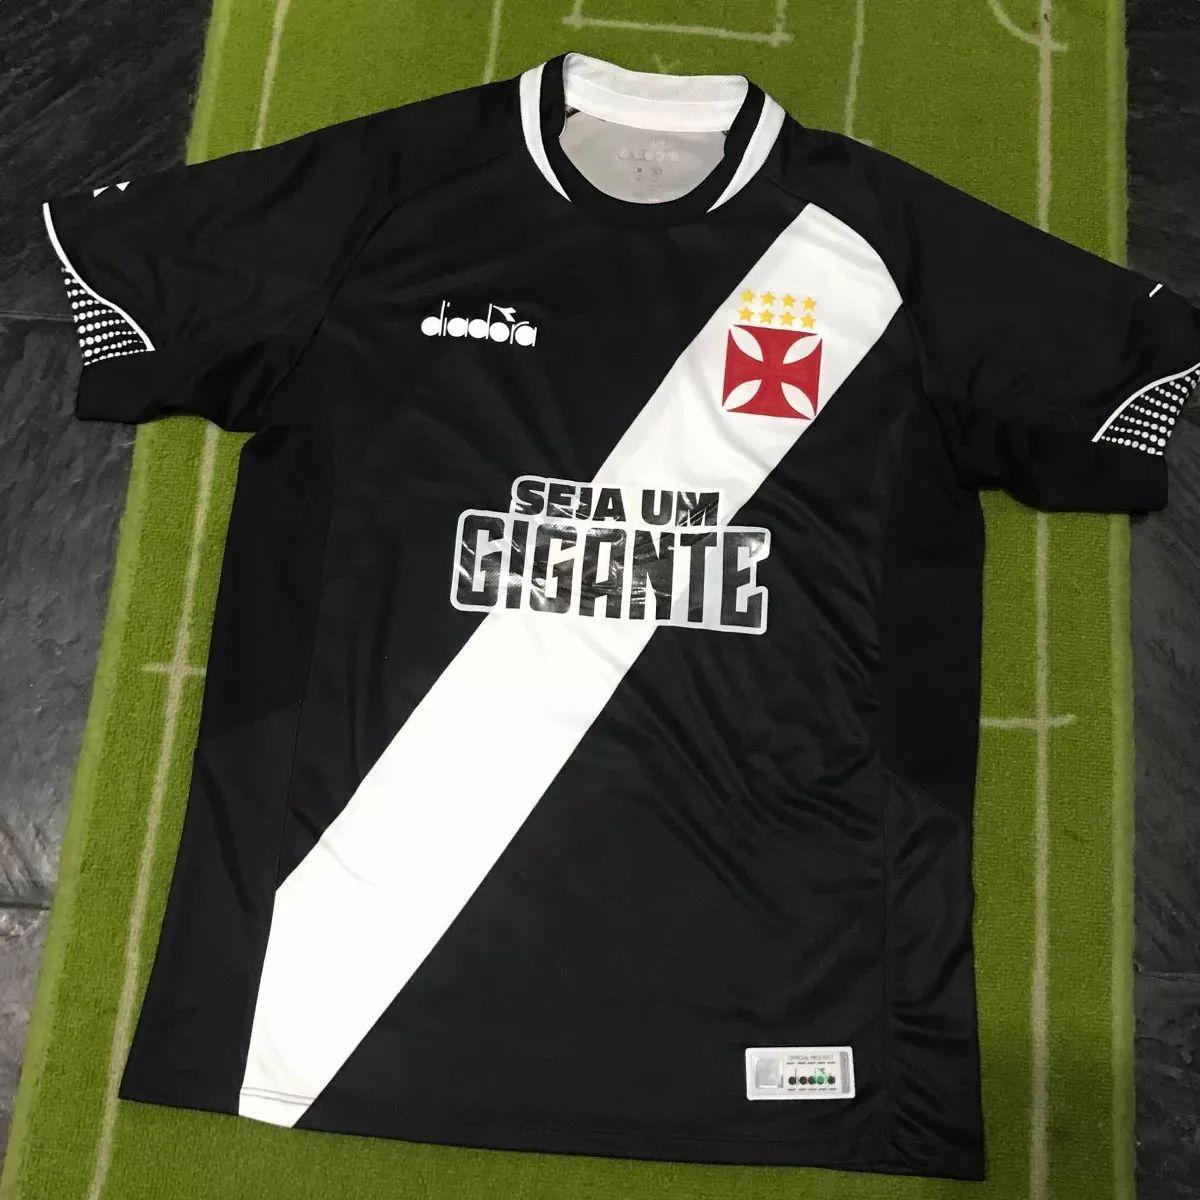 Vasco da Gama Home maglia di calcio 2018 - 2019. Sponsored by Seja ...